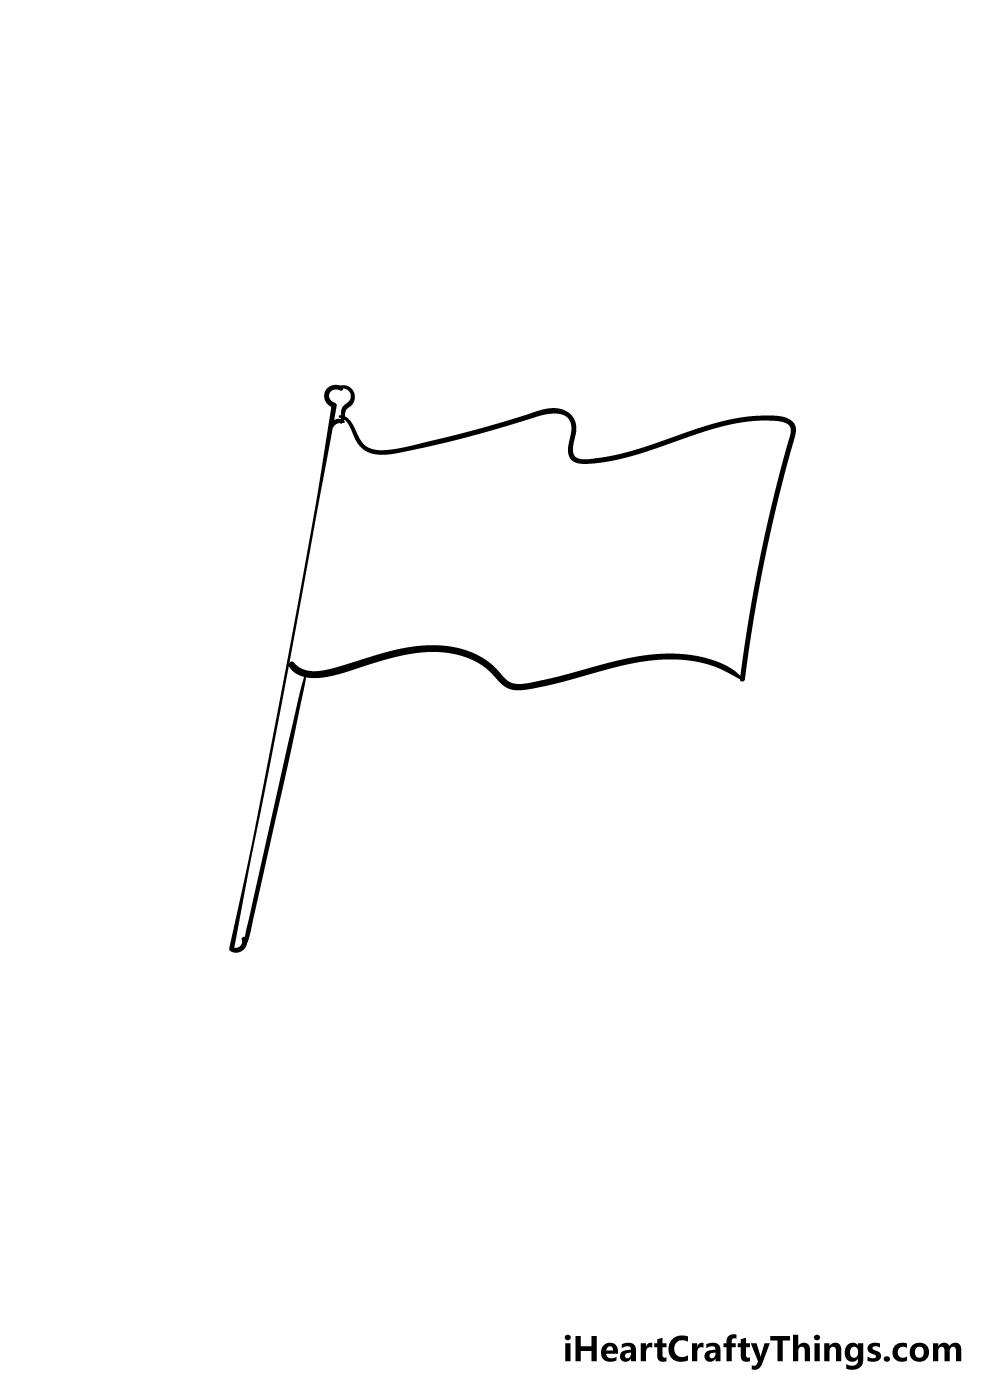 flag drawing step 4